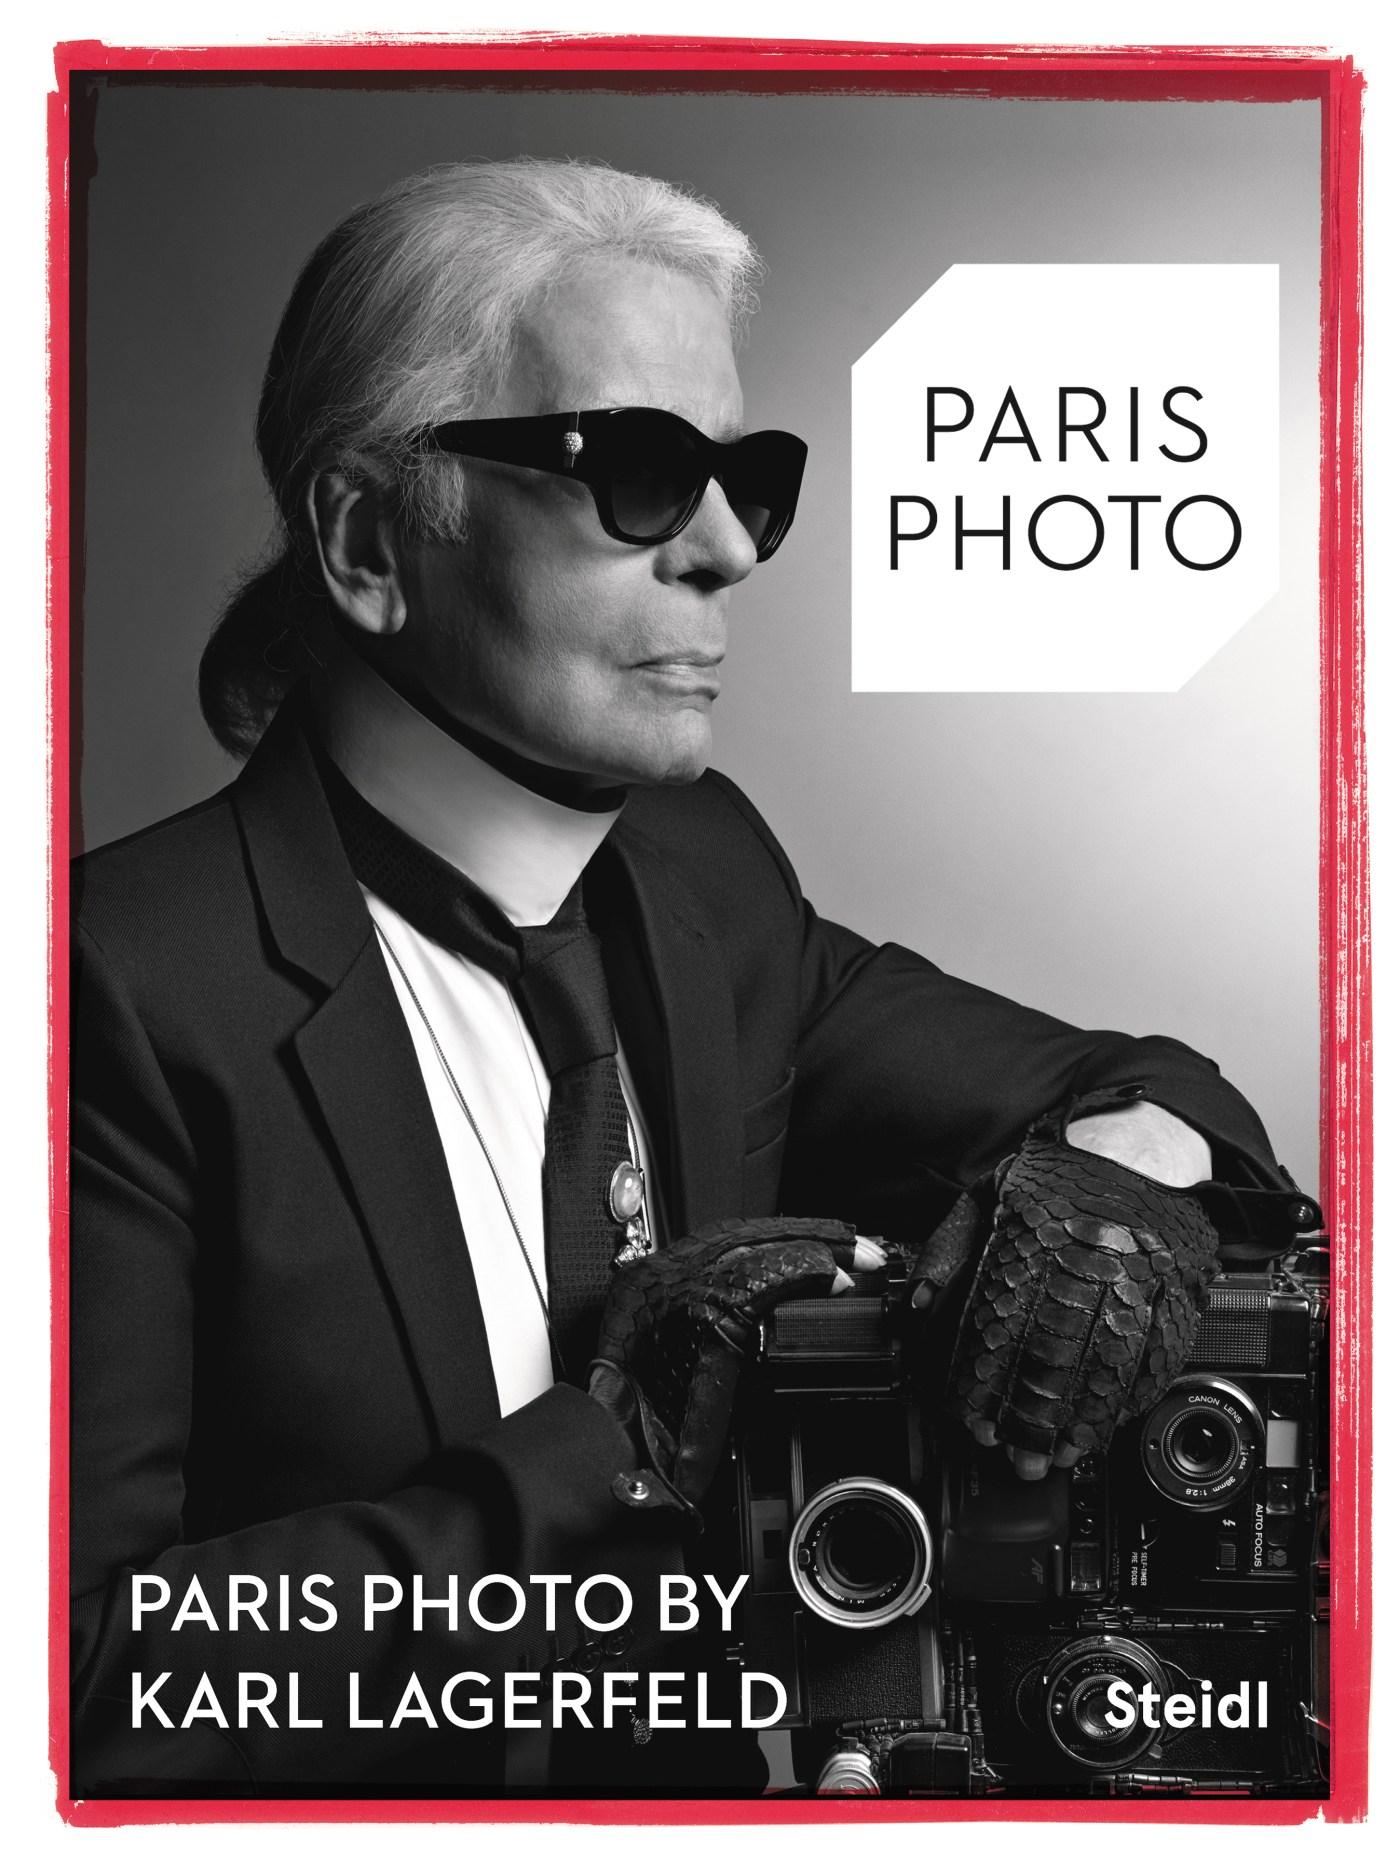 Paris_Photo_by_Karl_Lagerfeld